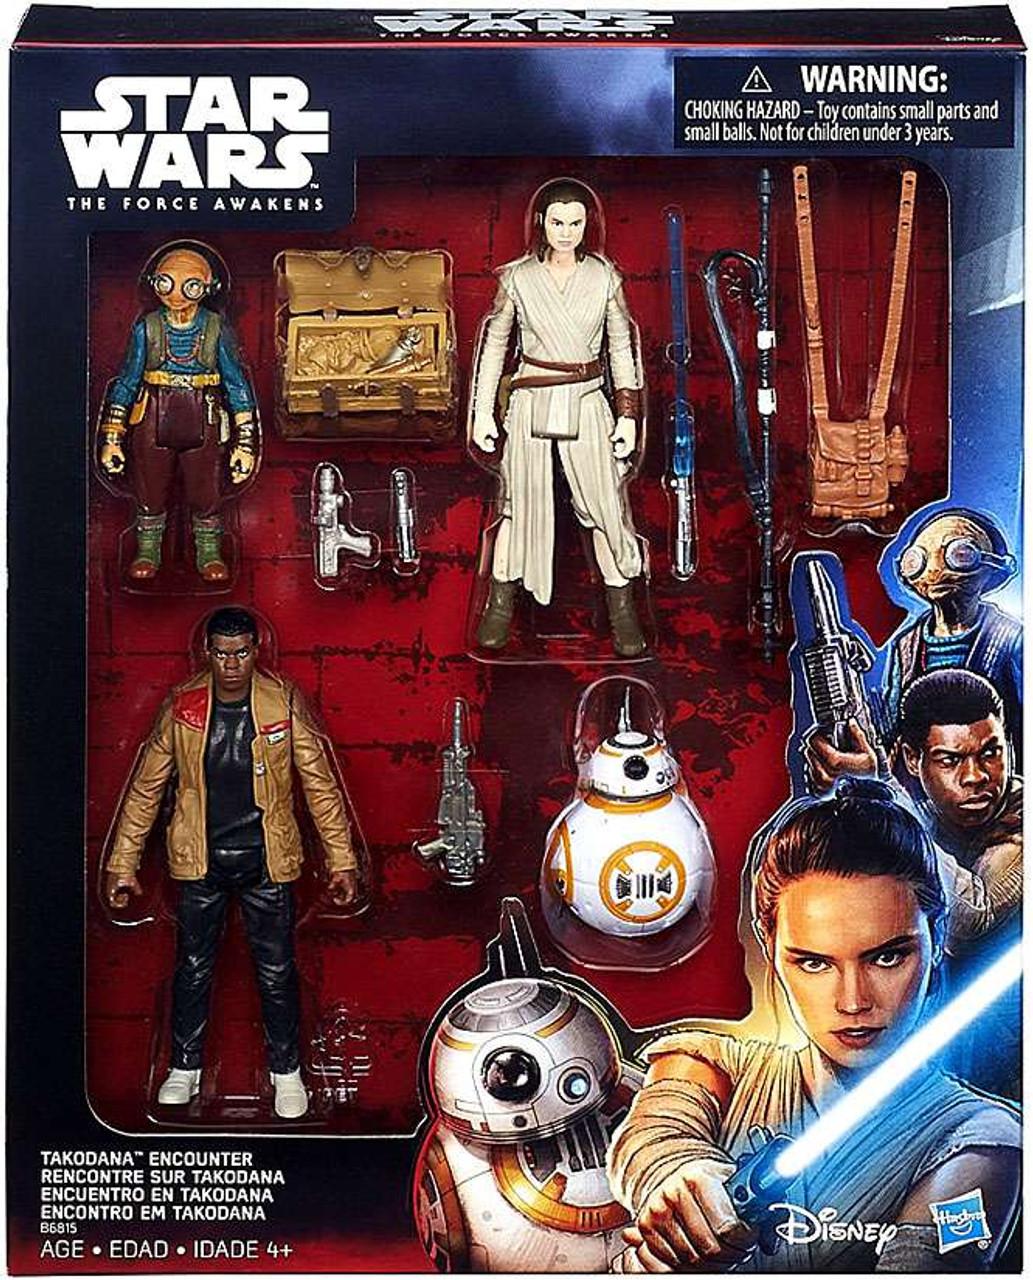 Star Wars The Force Awakens Takodana Encounter 3.75 Action Figures Maz Kanata